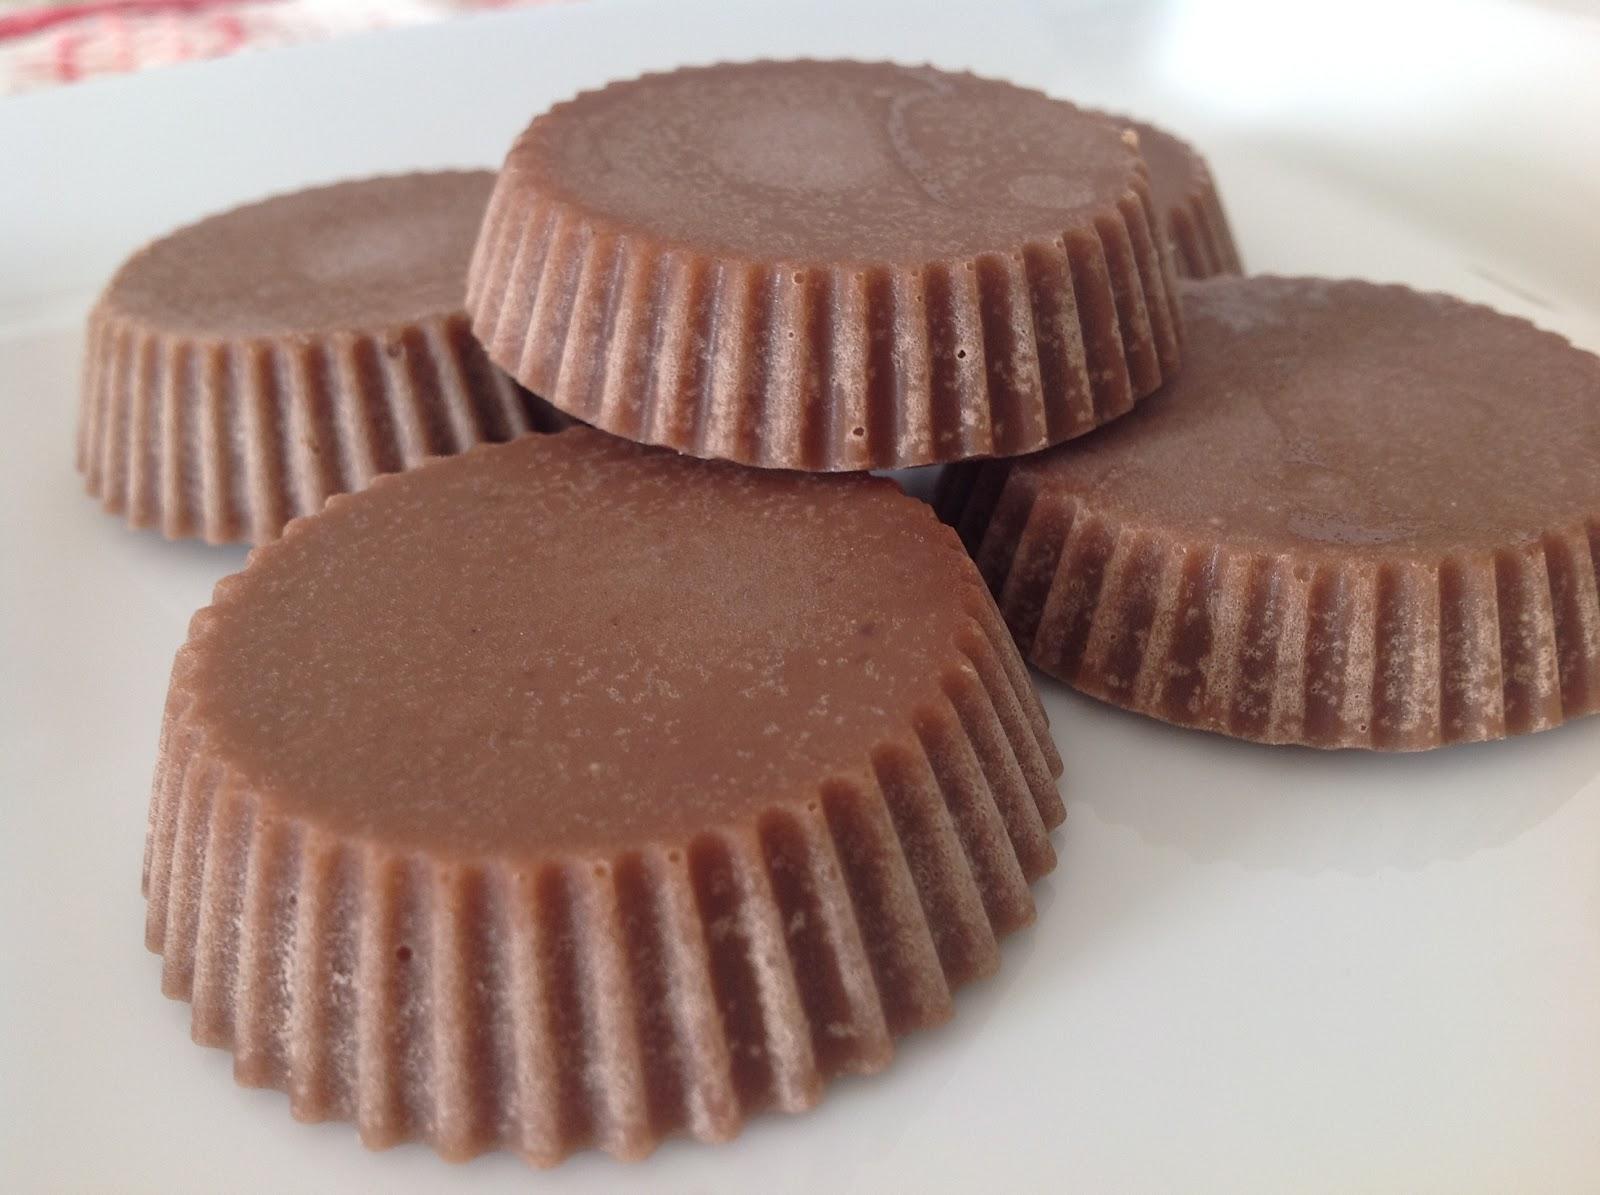 recette bonbons caramel et chocolat mes recettes r ussies. Black Bedroom Furniture Sets. Home Design Ideas